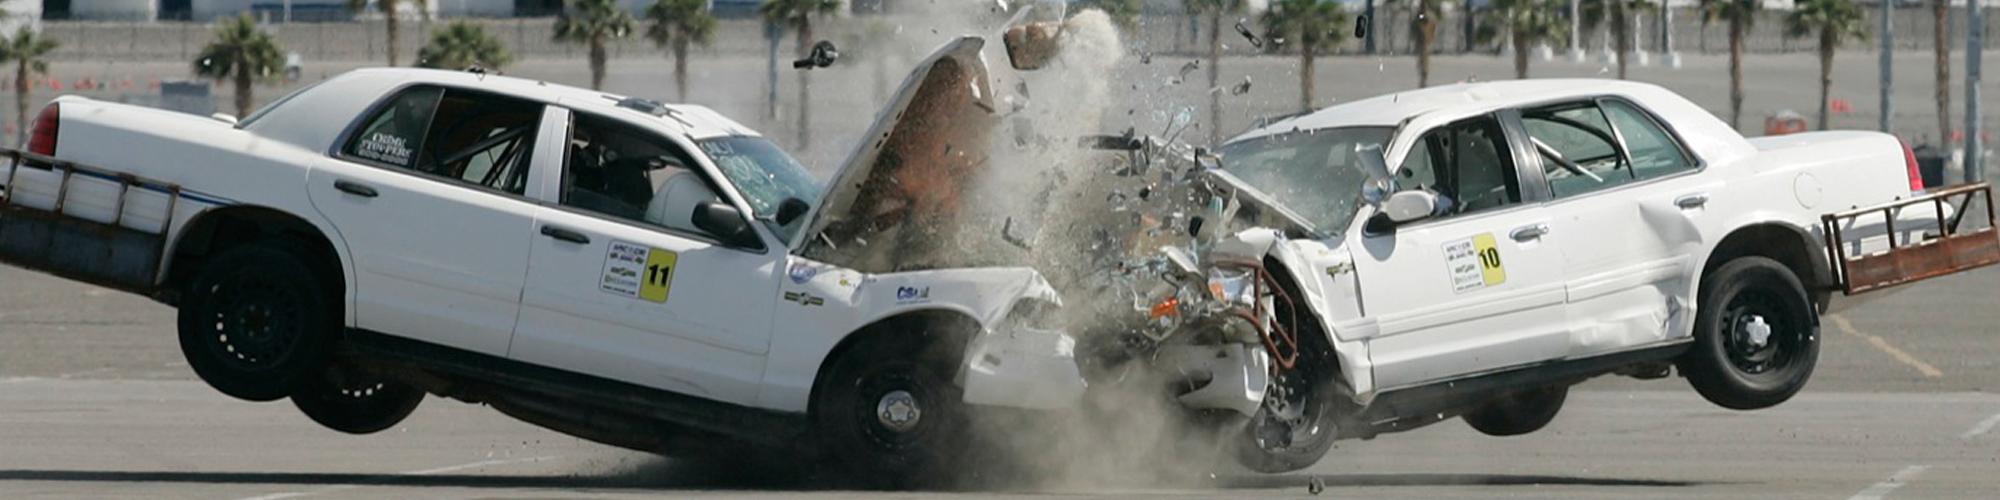 Collision Safety Institute, Crash Data Retrieval, Crash Testing, Rusty Haight, Human Crash Test Dummy, Vehicle Black Box, Event Data Recorder, EDR, CDR, Training, Crash Testing, Collision